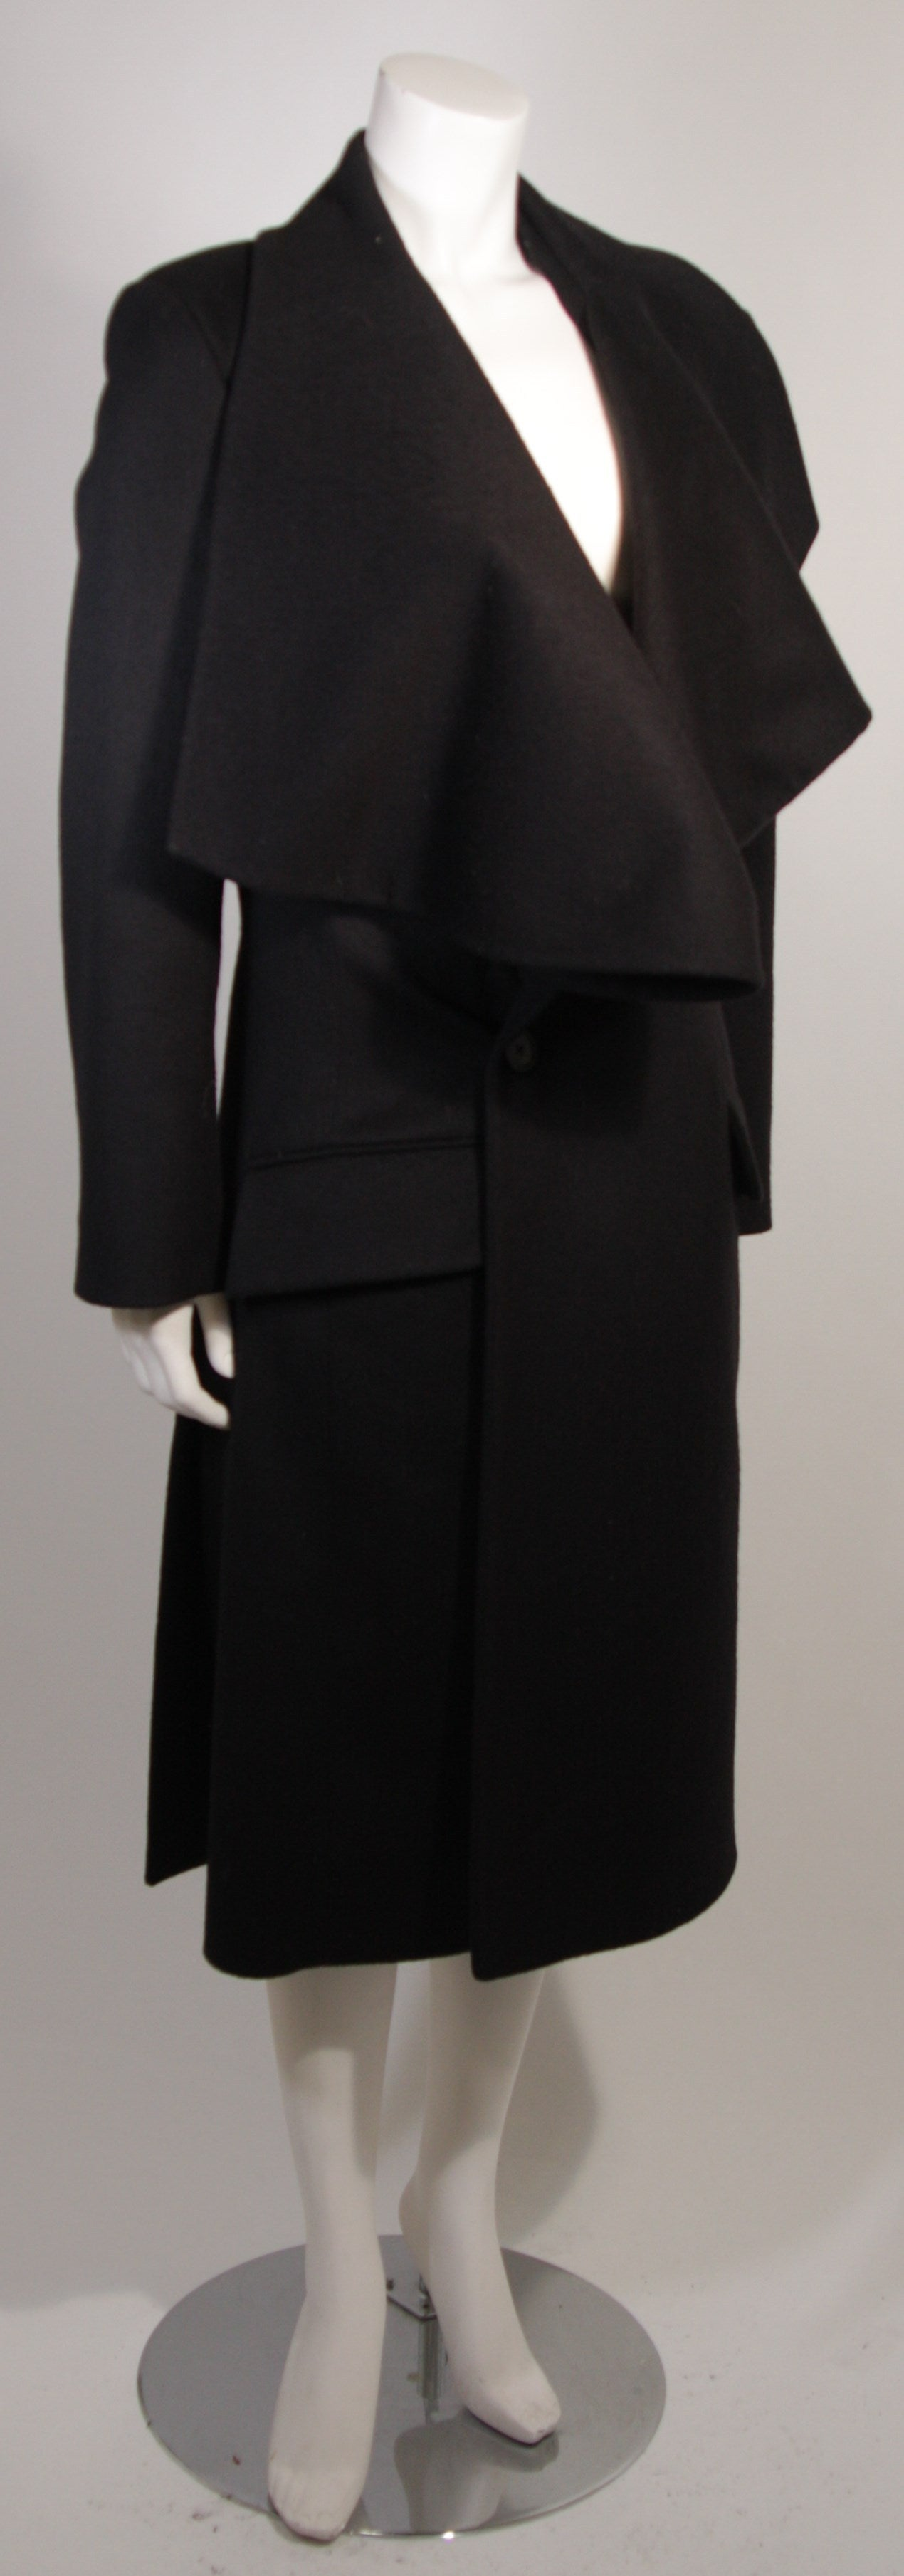 John Galliano Over-Sized Asymmetrical Collar Coat Size 10 42 For Sale 1